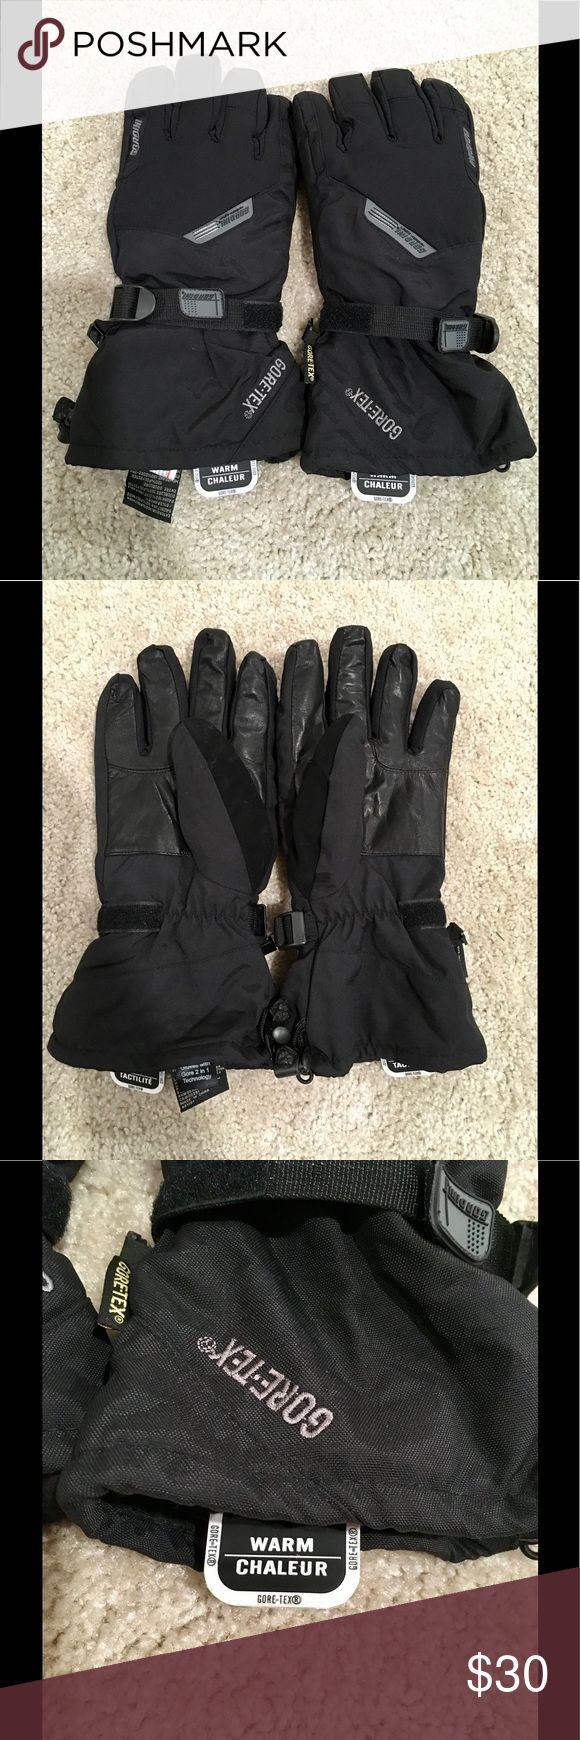 Gordini Gore-Tex Men's Ski/Snow Gloves NWOT Men's Gordini Gore-Tex snow/ski gloves. Waterproof, insulated with fleece lining. Size extra large. Gordini Accessories Gloves